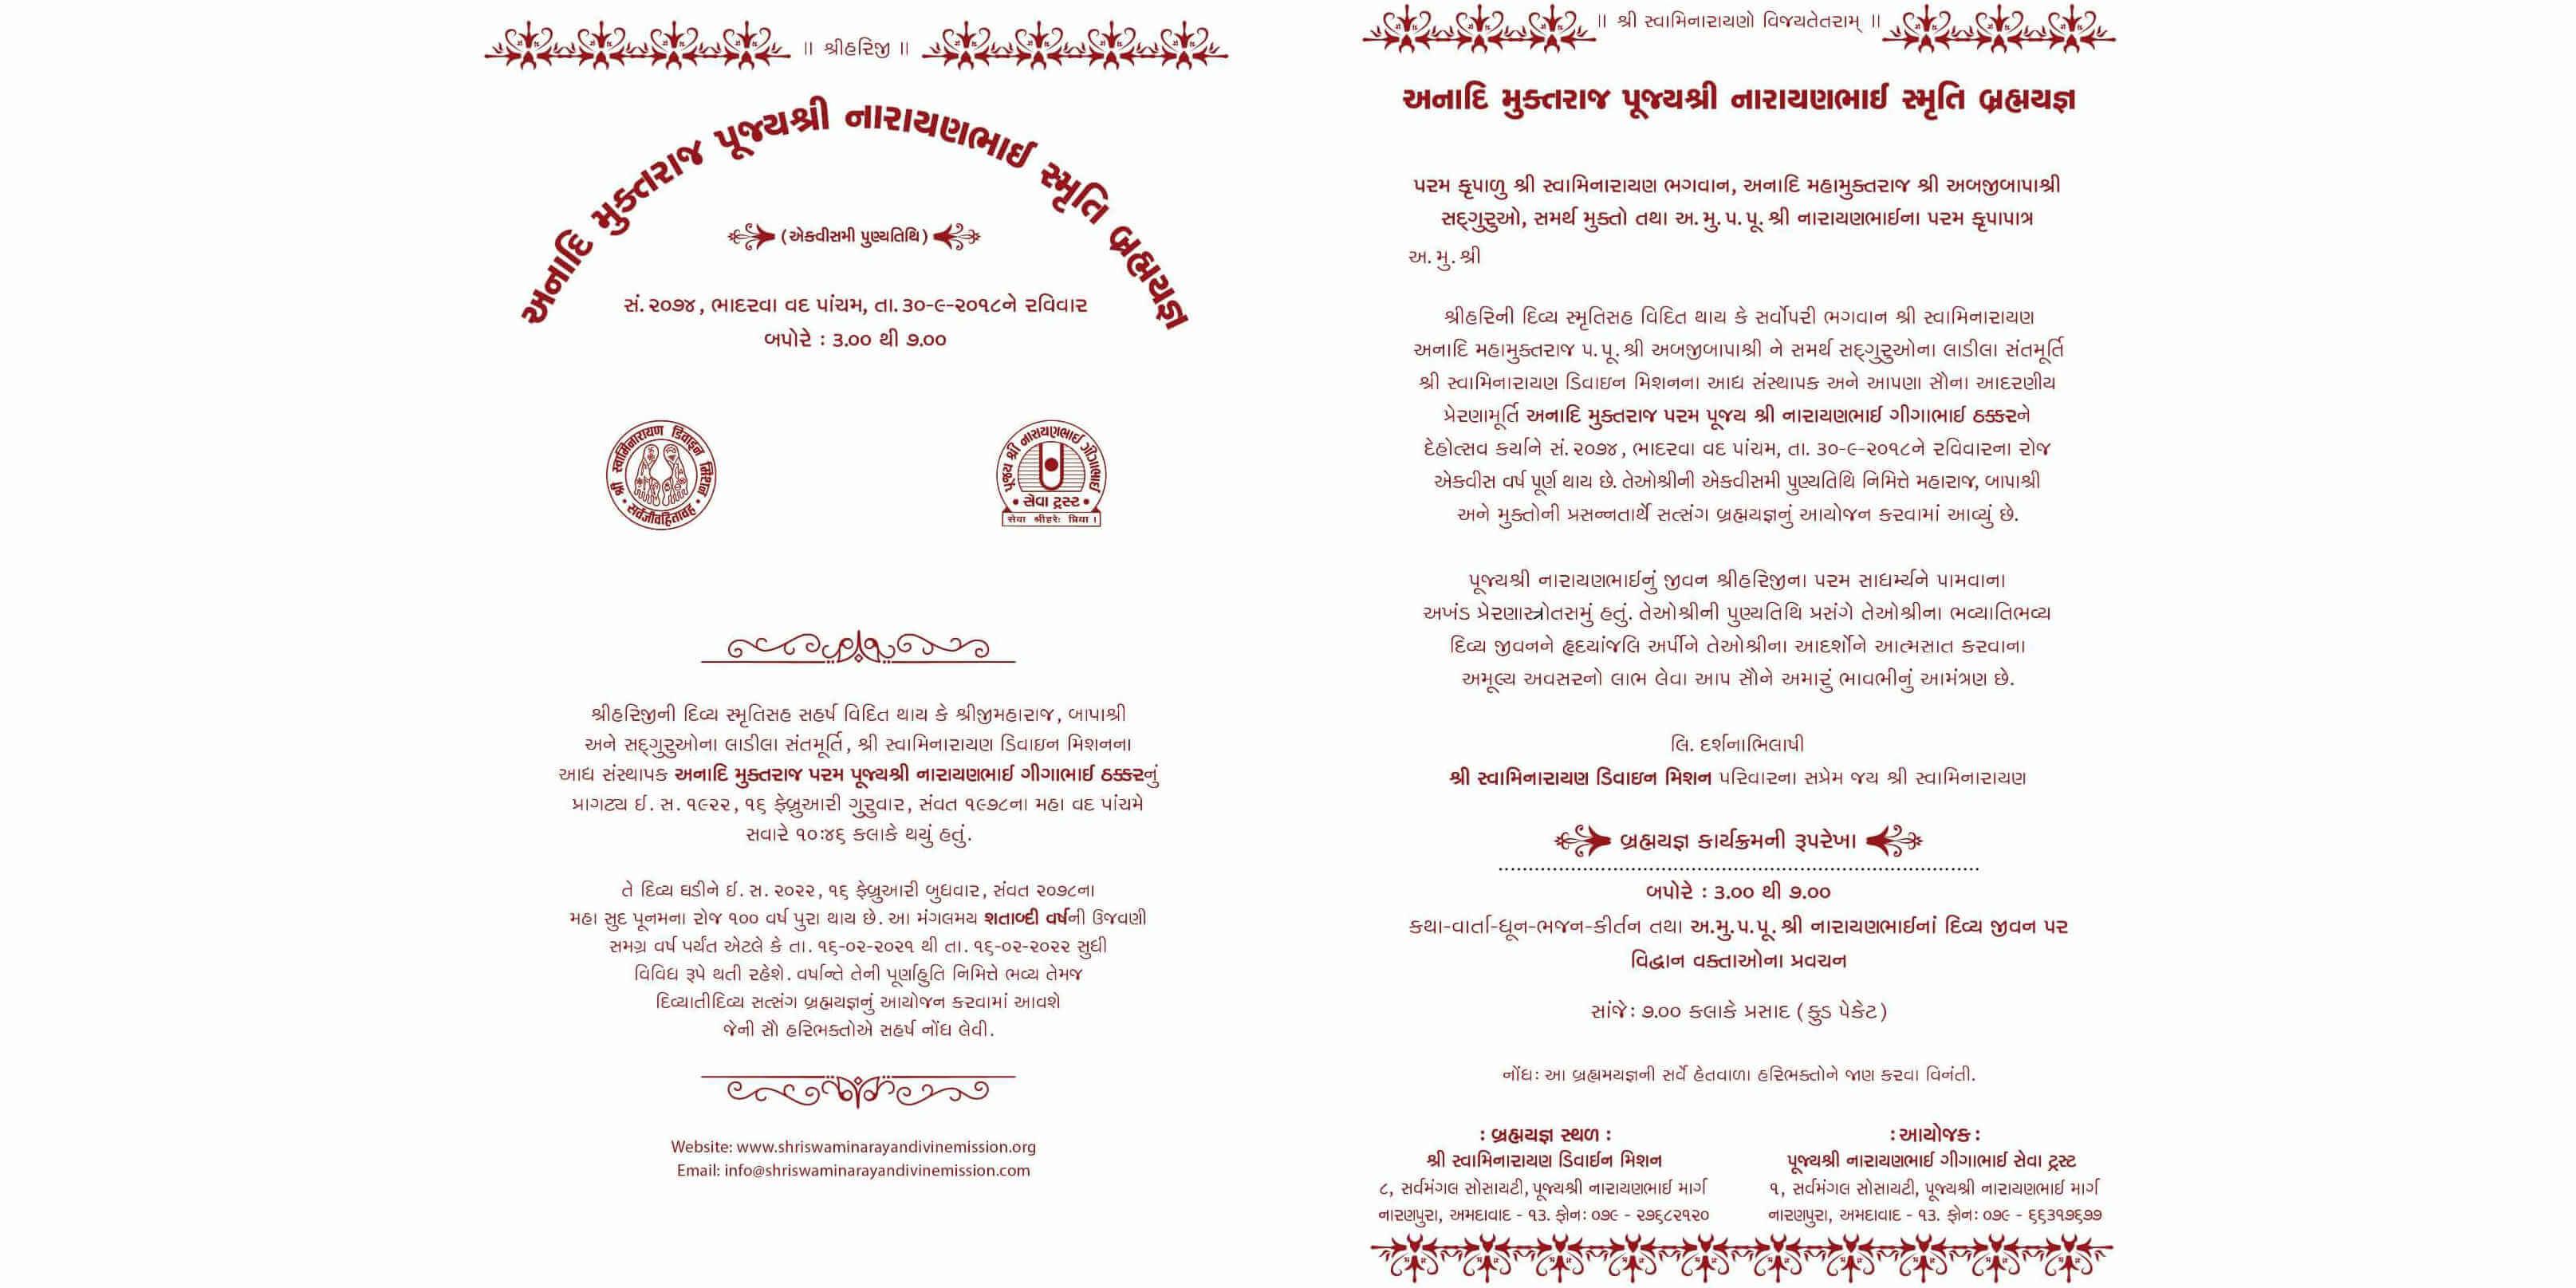 Watch Pujyashri Narayanbhai Smruti Brahmyagna Dt: 30/09/2018